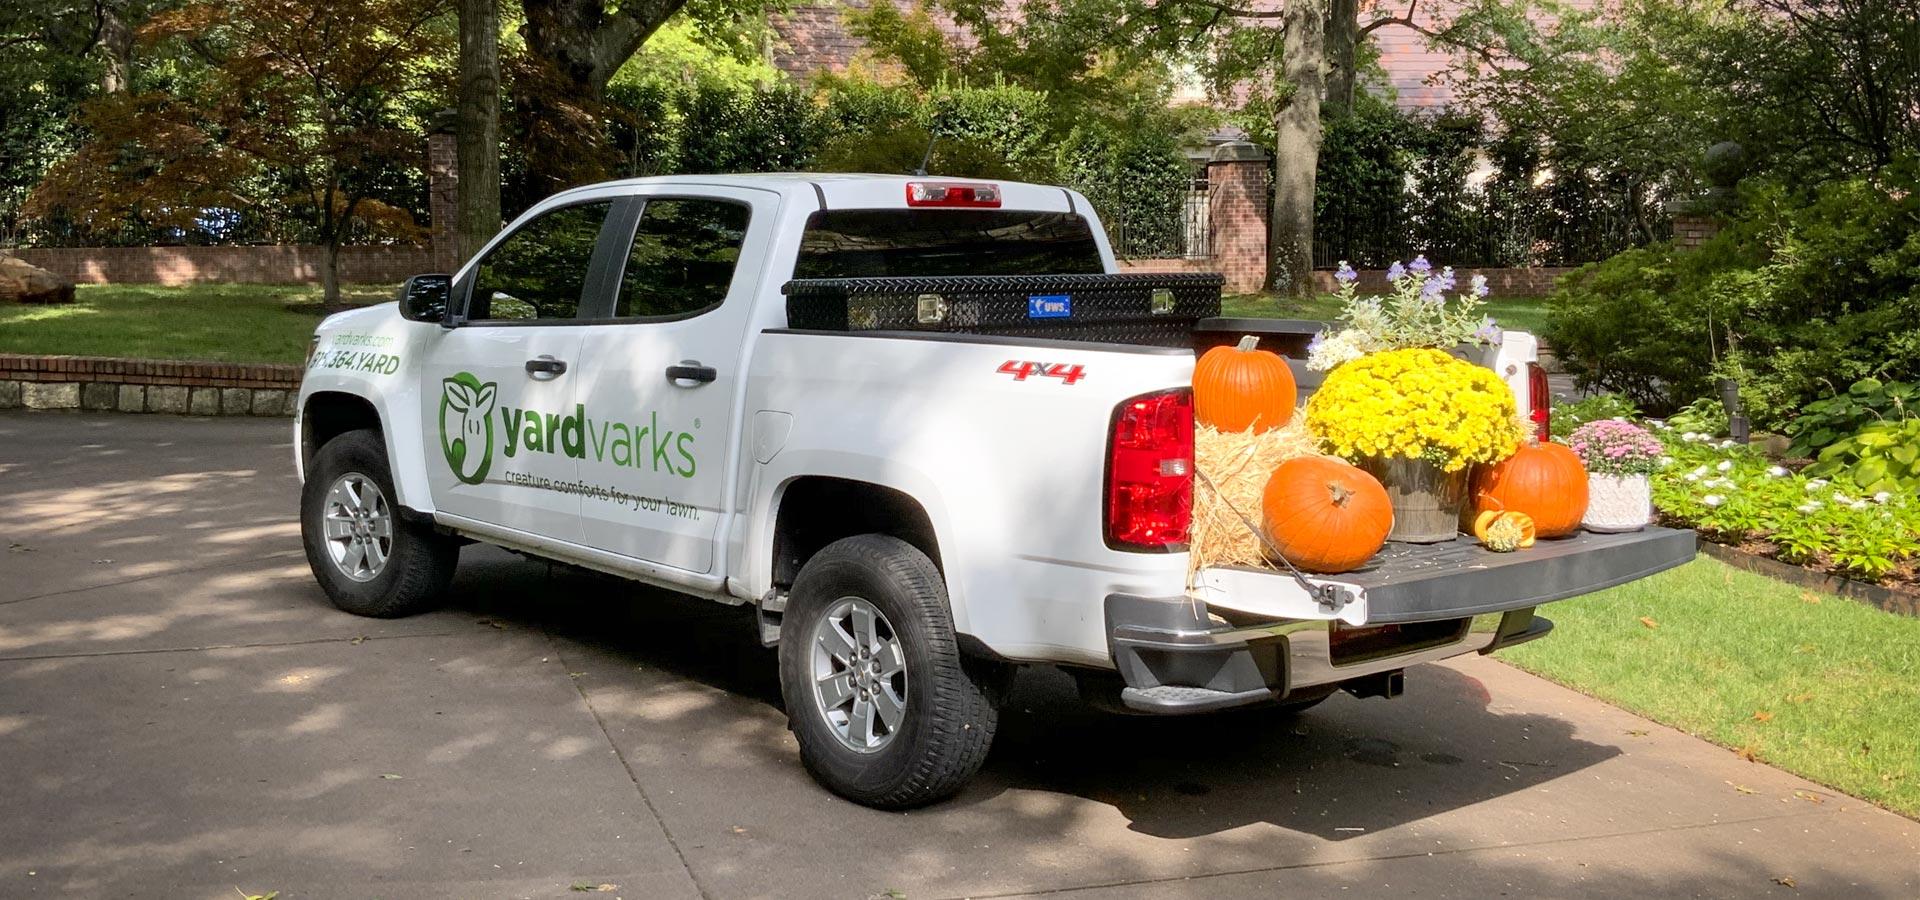 yardvarks fall services truck